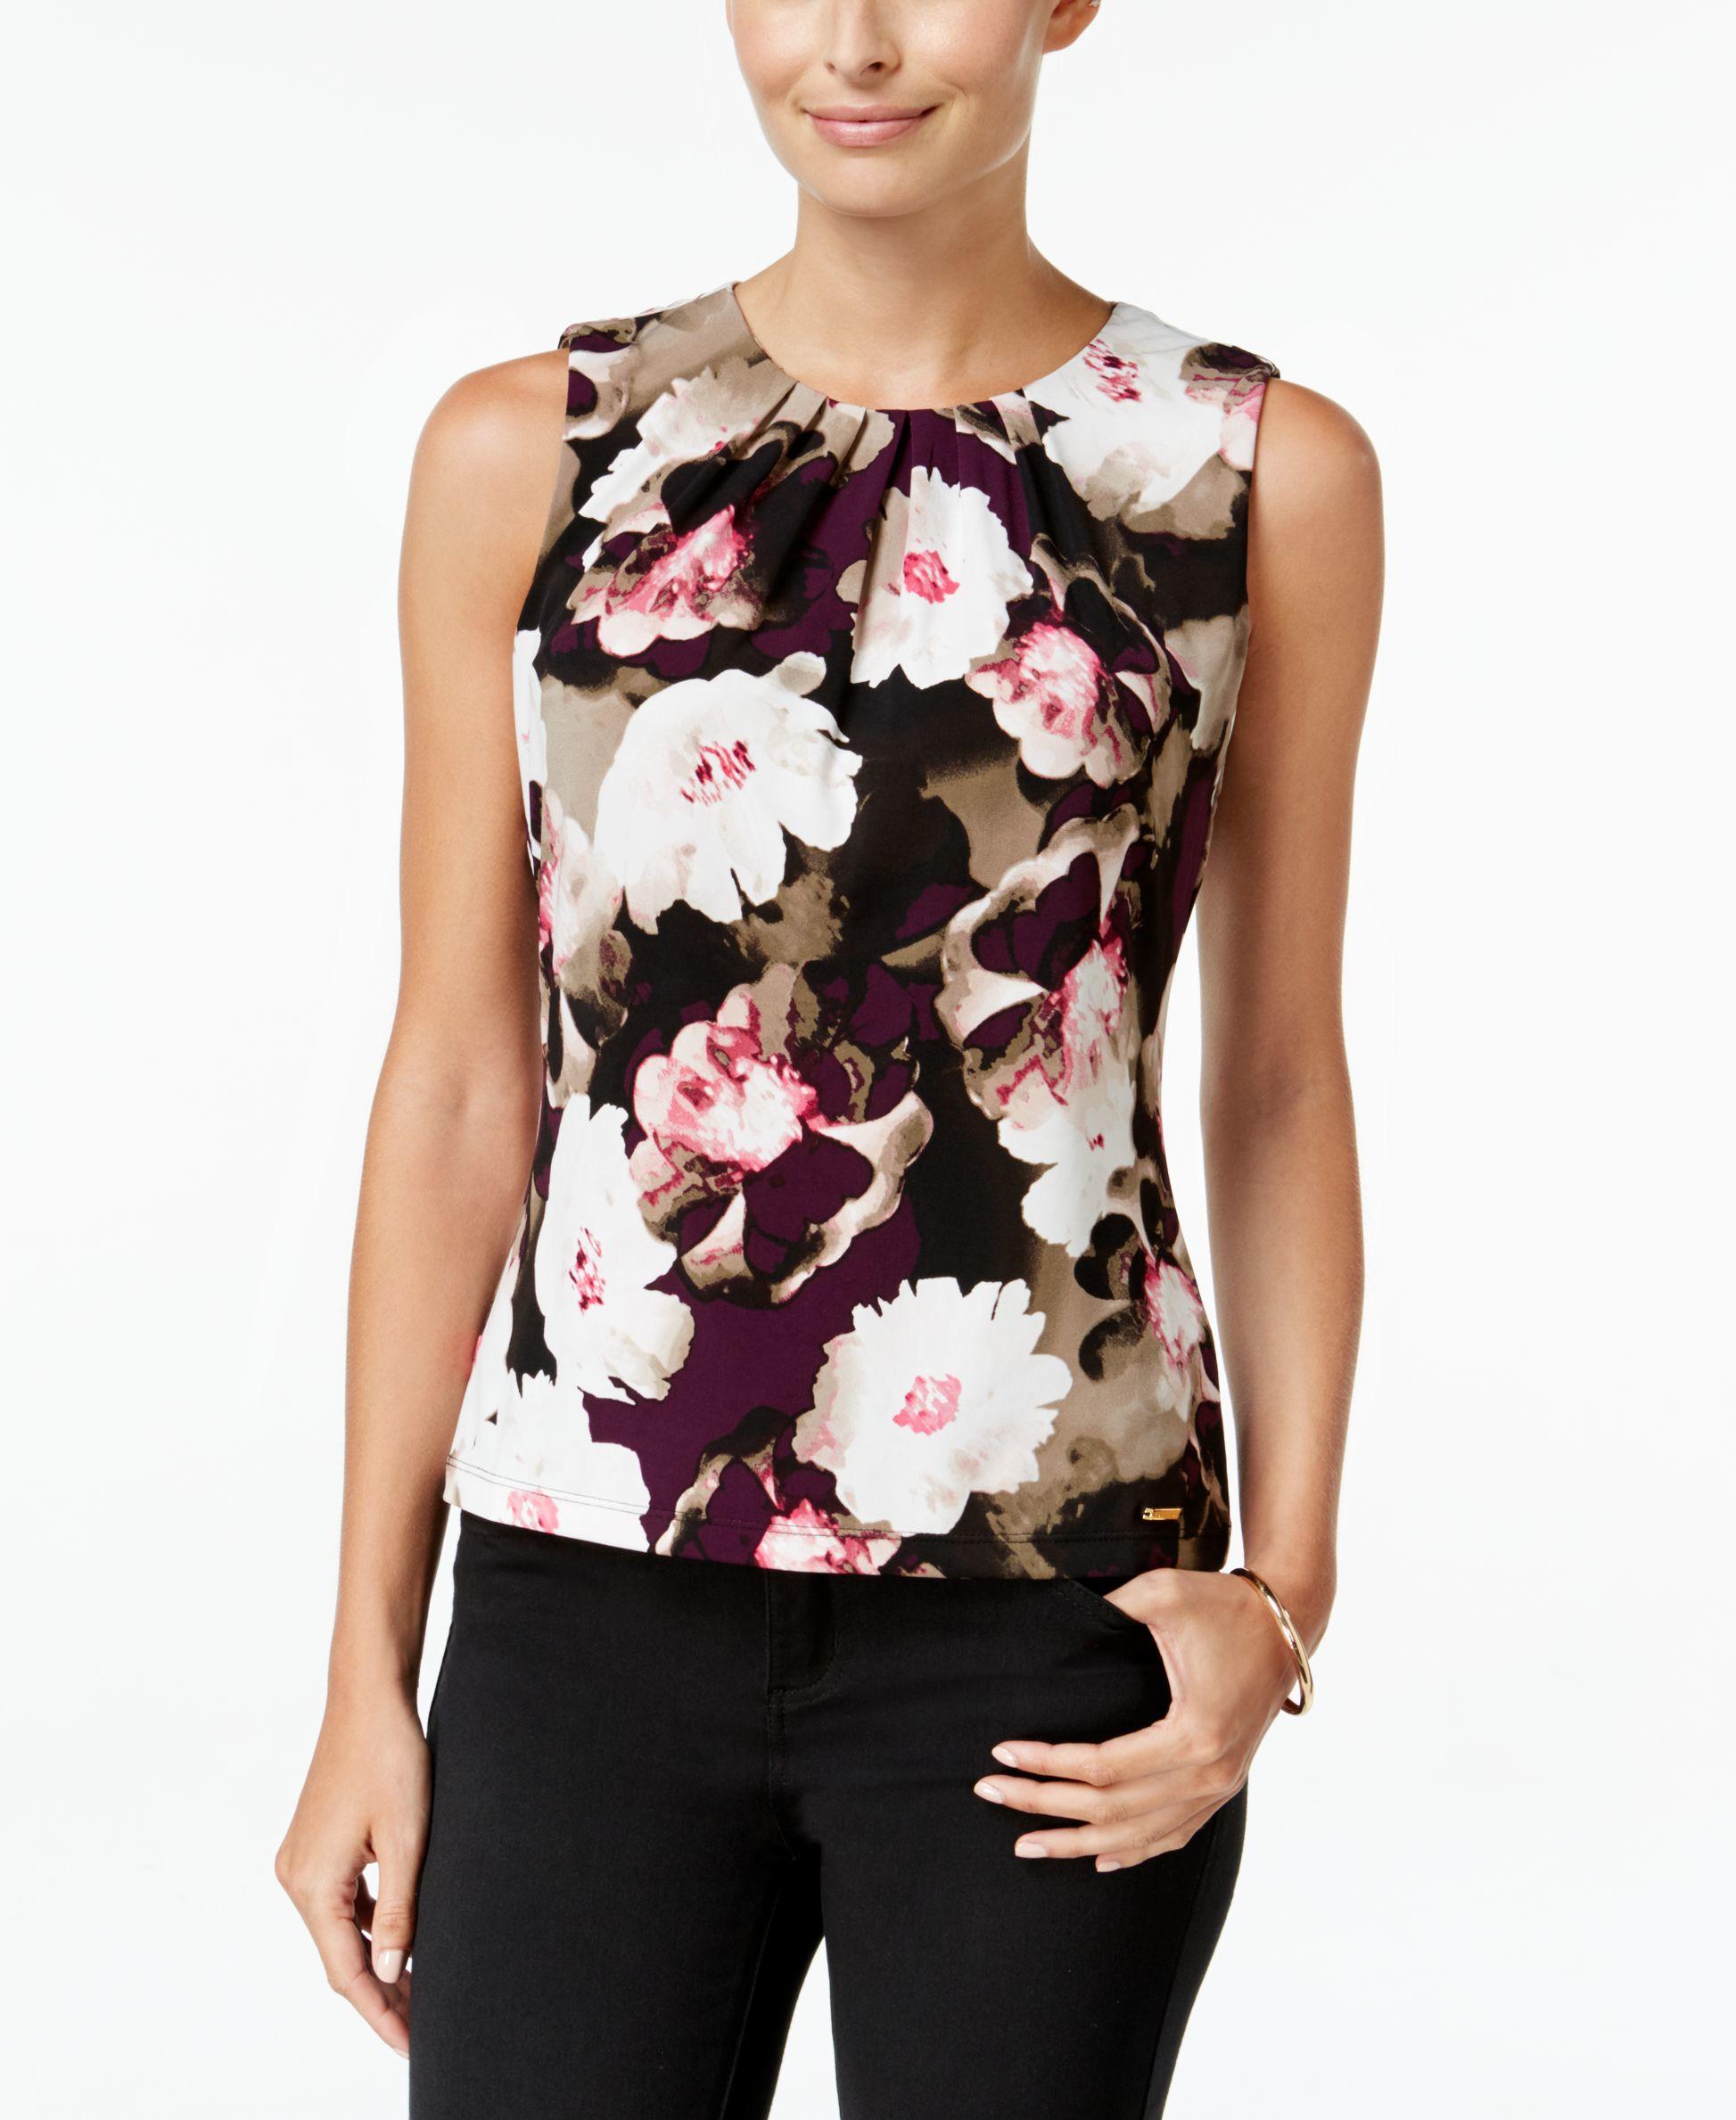 cb6319a5eb276 Lyst - Calvin Klein Floral-print Pleat-neck Top